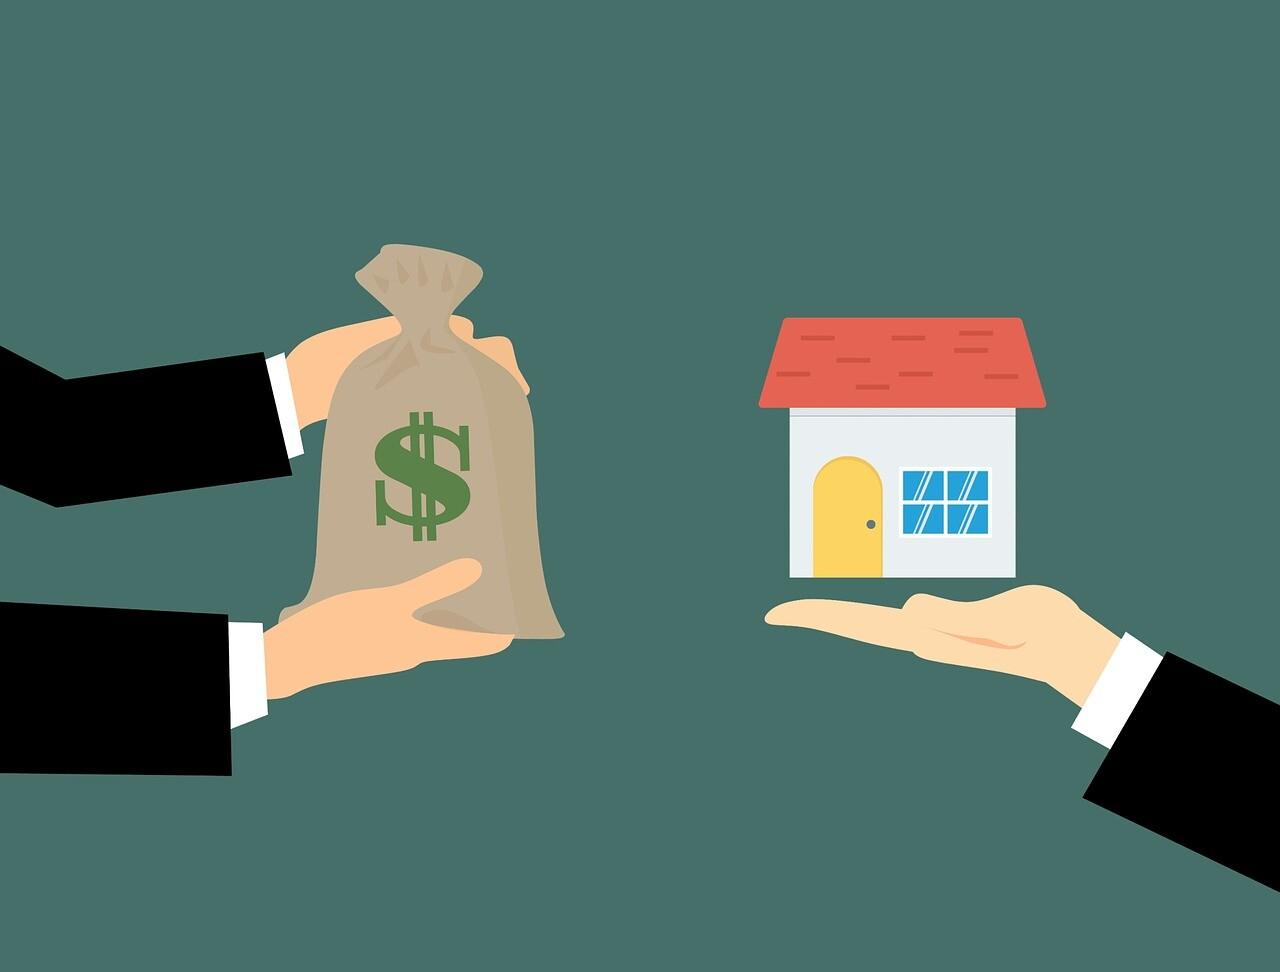 creditos-de-liquidez-a-traves-de-la-vivienda-aumentan-5-alt